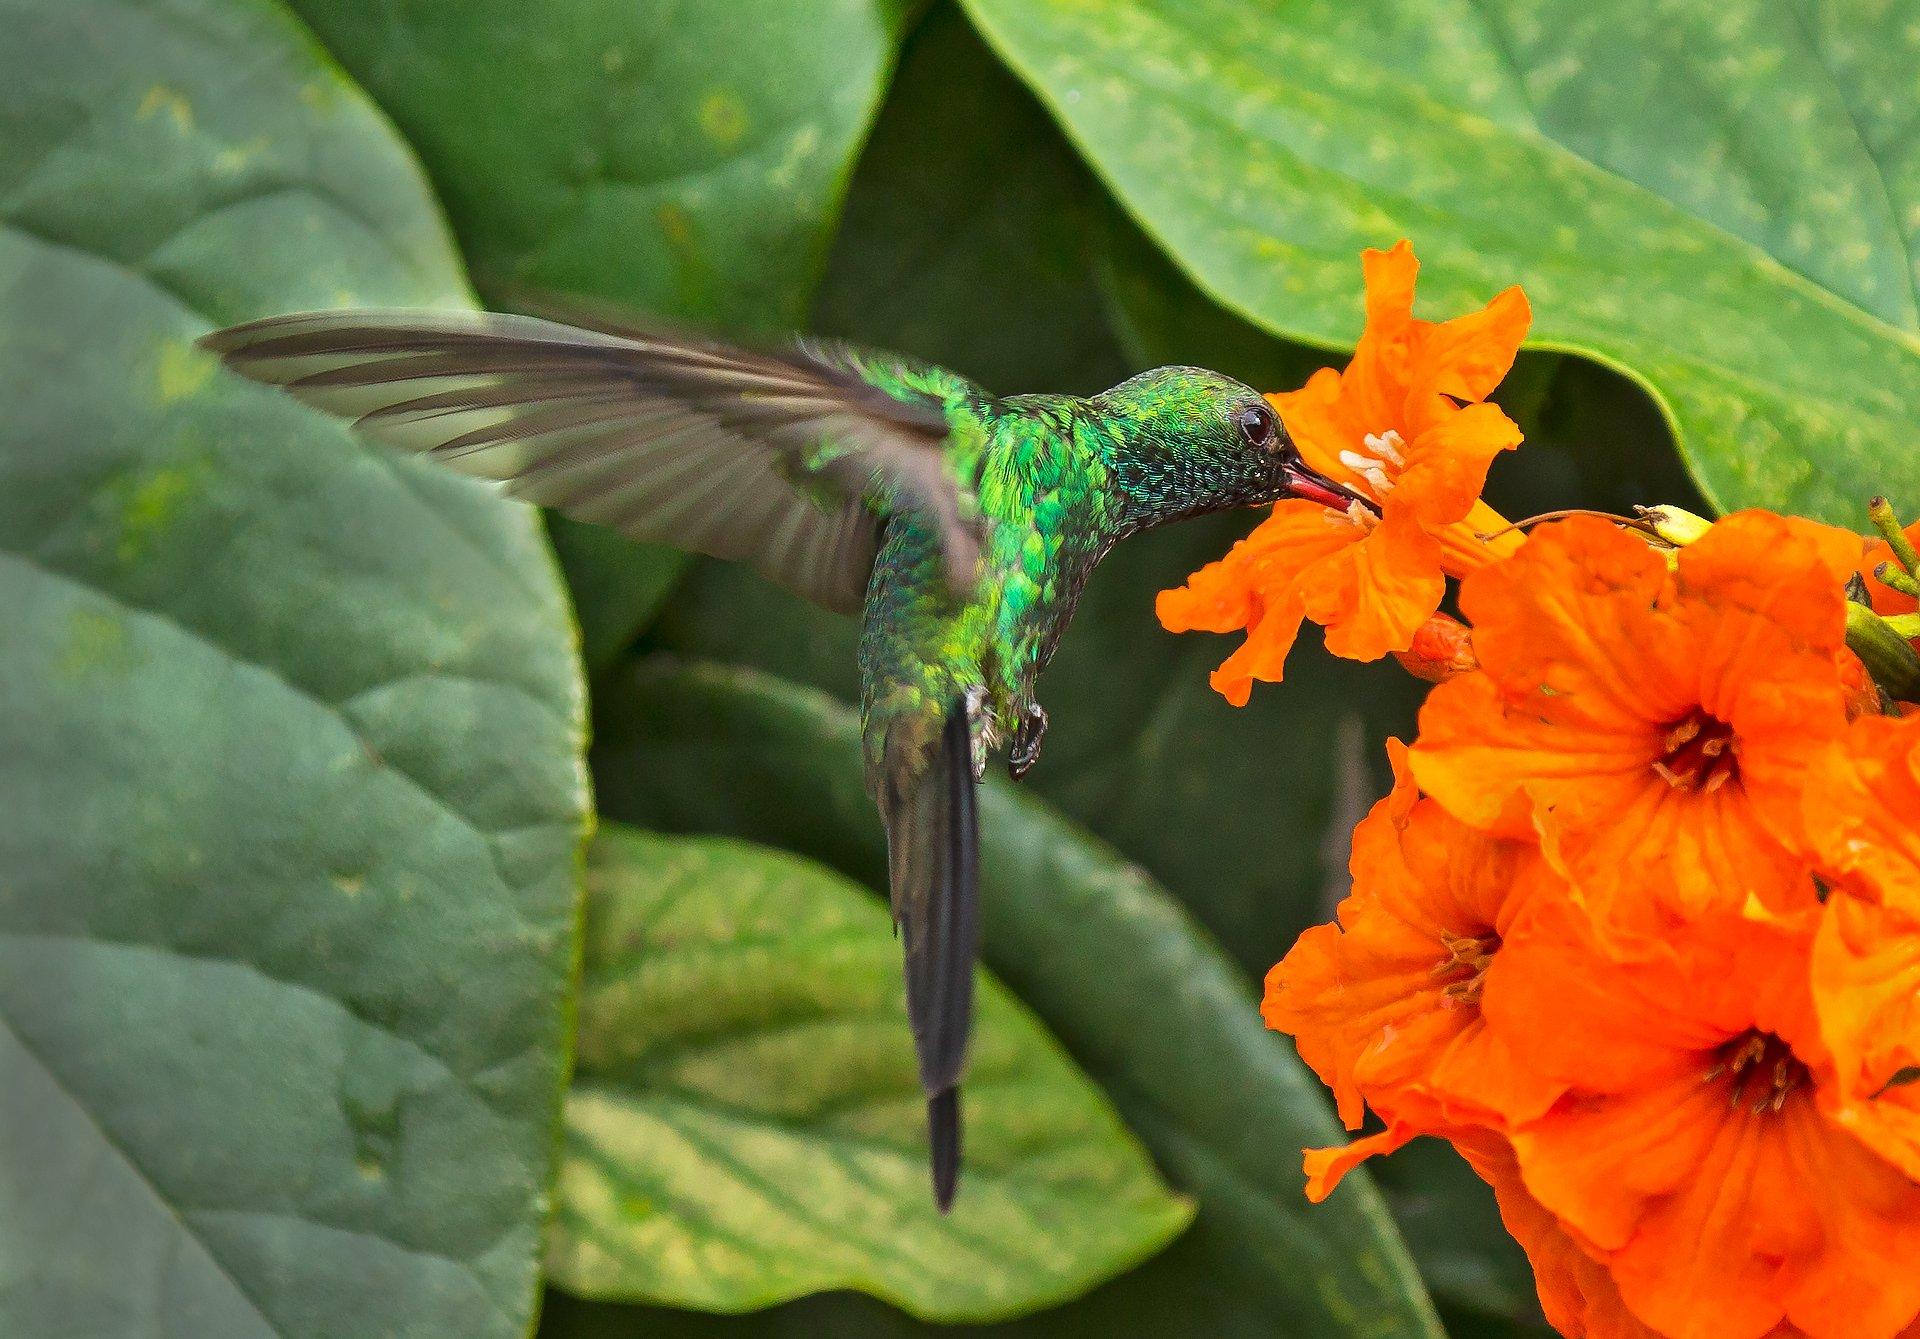 cuban emerald, hummingbird, cuba, flowers, nectar, кубинский изумрудный колибри, колибри, куба, цветы, нектар,, G A S